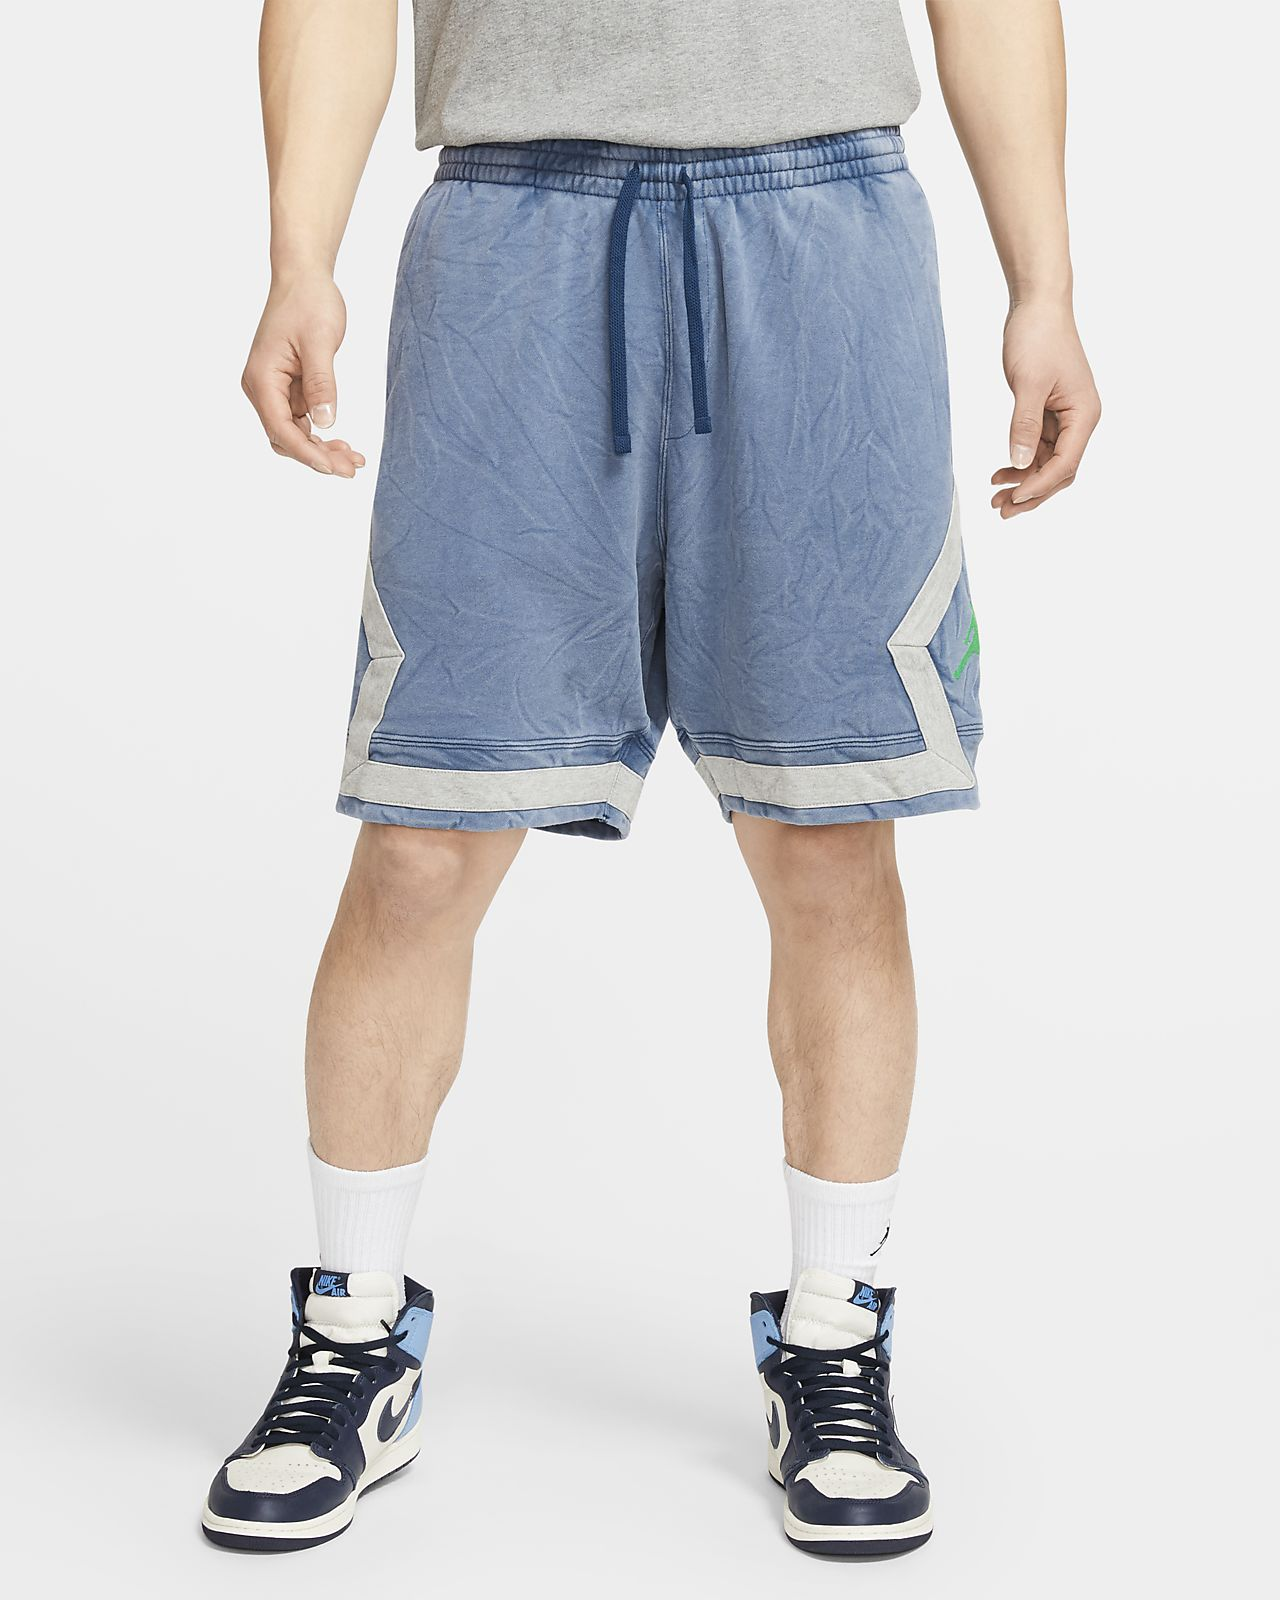 Jordan Legacy AJ13 Men's Diamond Shorts